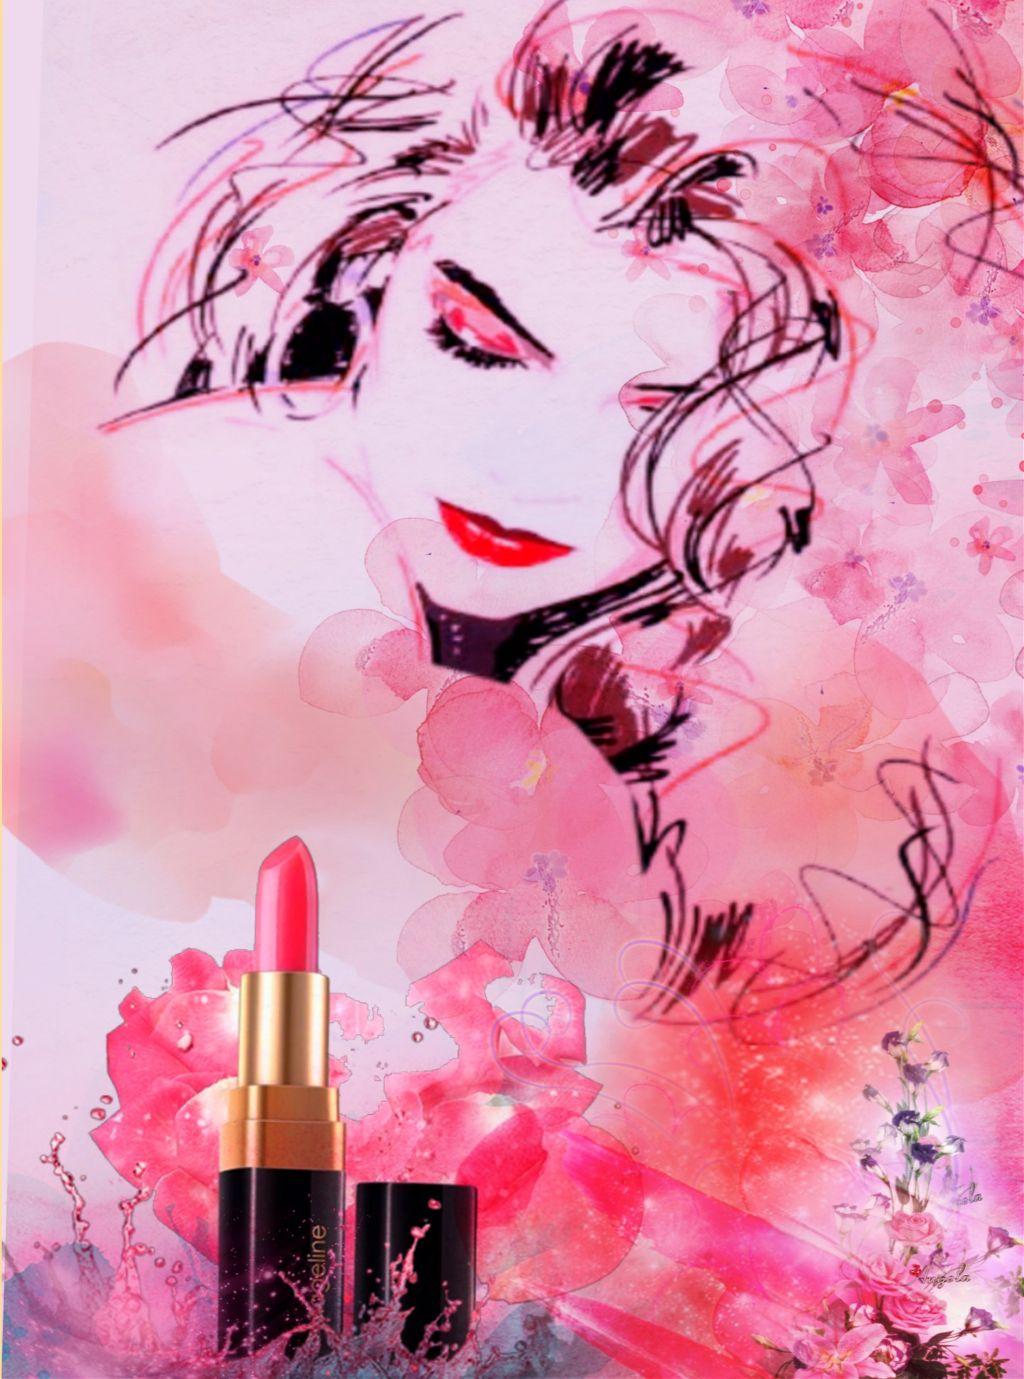 #freetoedit #lipstickday #irclipstickday  #watercolors #doubleexposure #layersonlayers #drawtools #adjusttools #newfilters #stickerart #myart #myedit #madewithpicsart